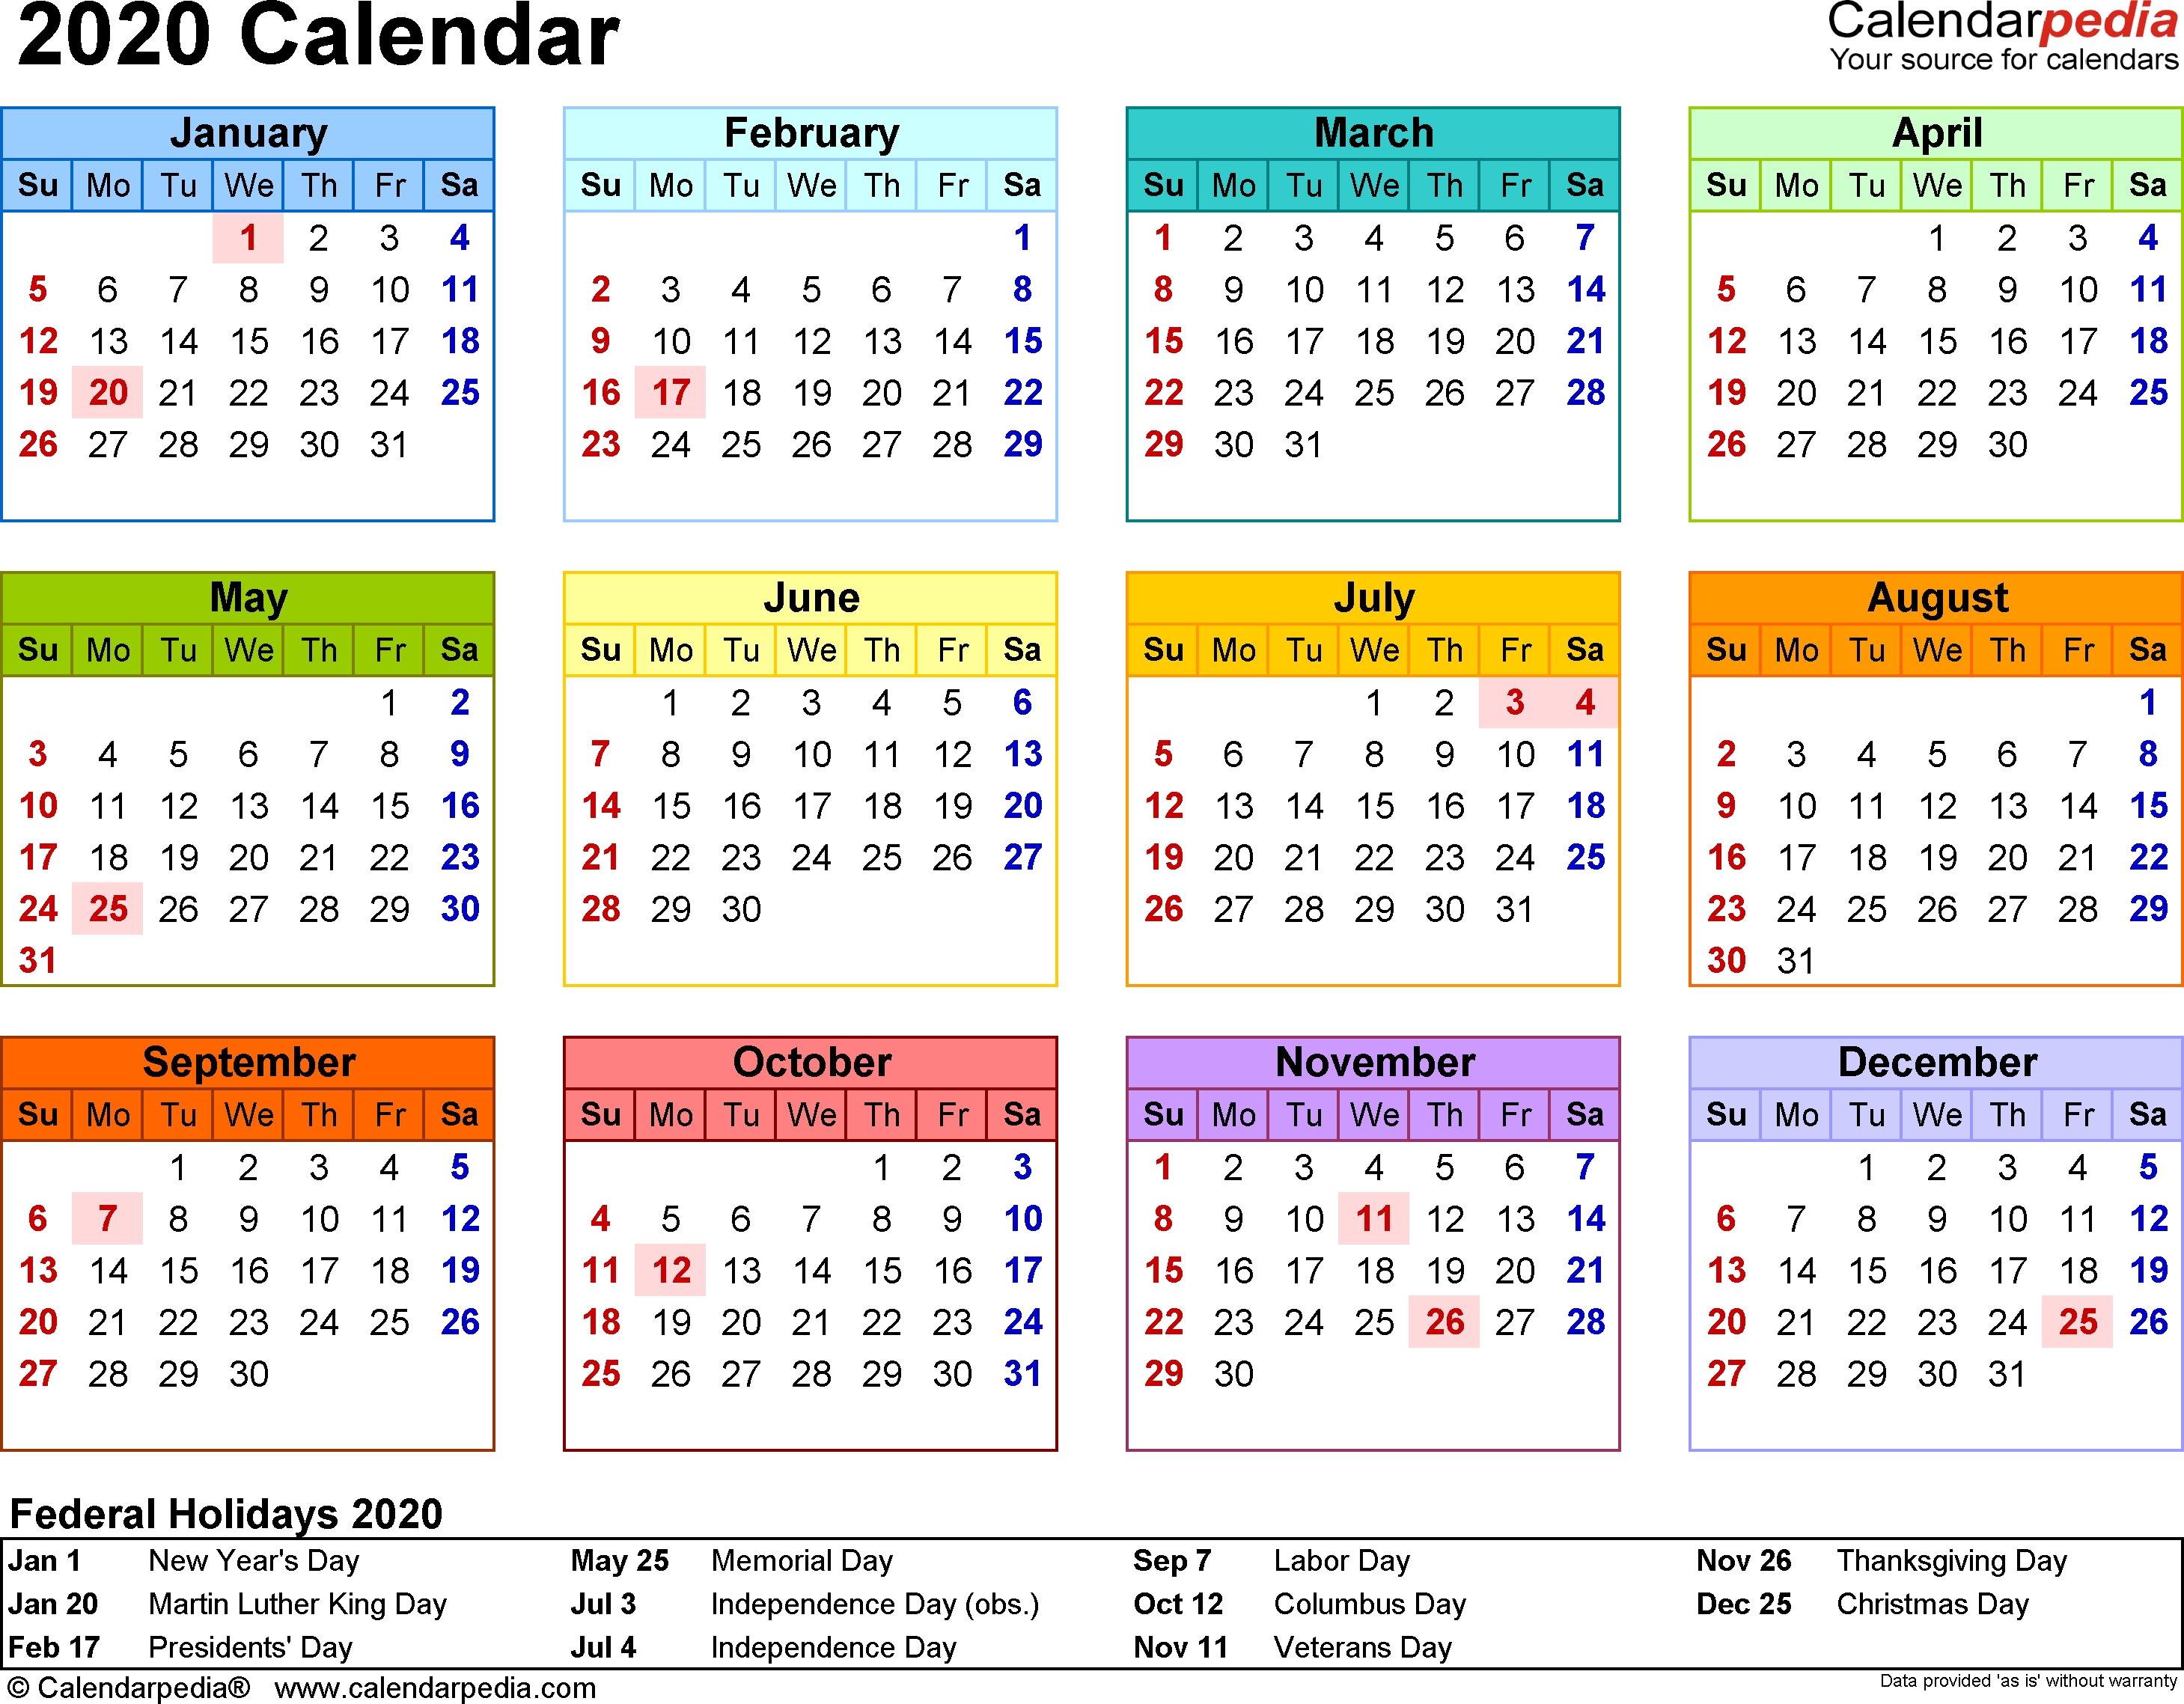 2020 Calendar - 17 Free Printable Word Calendar Templates 2020 Calendar In Word